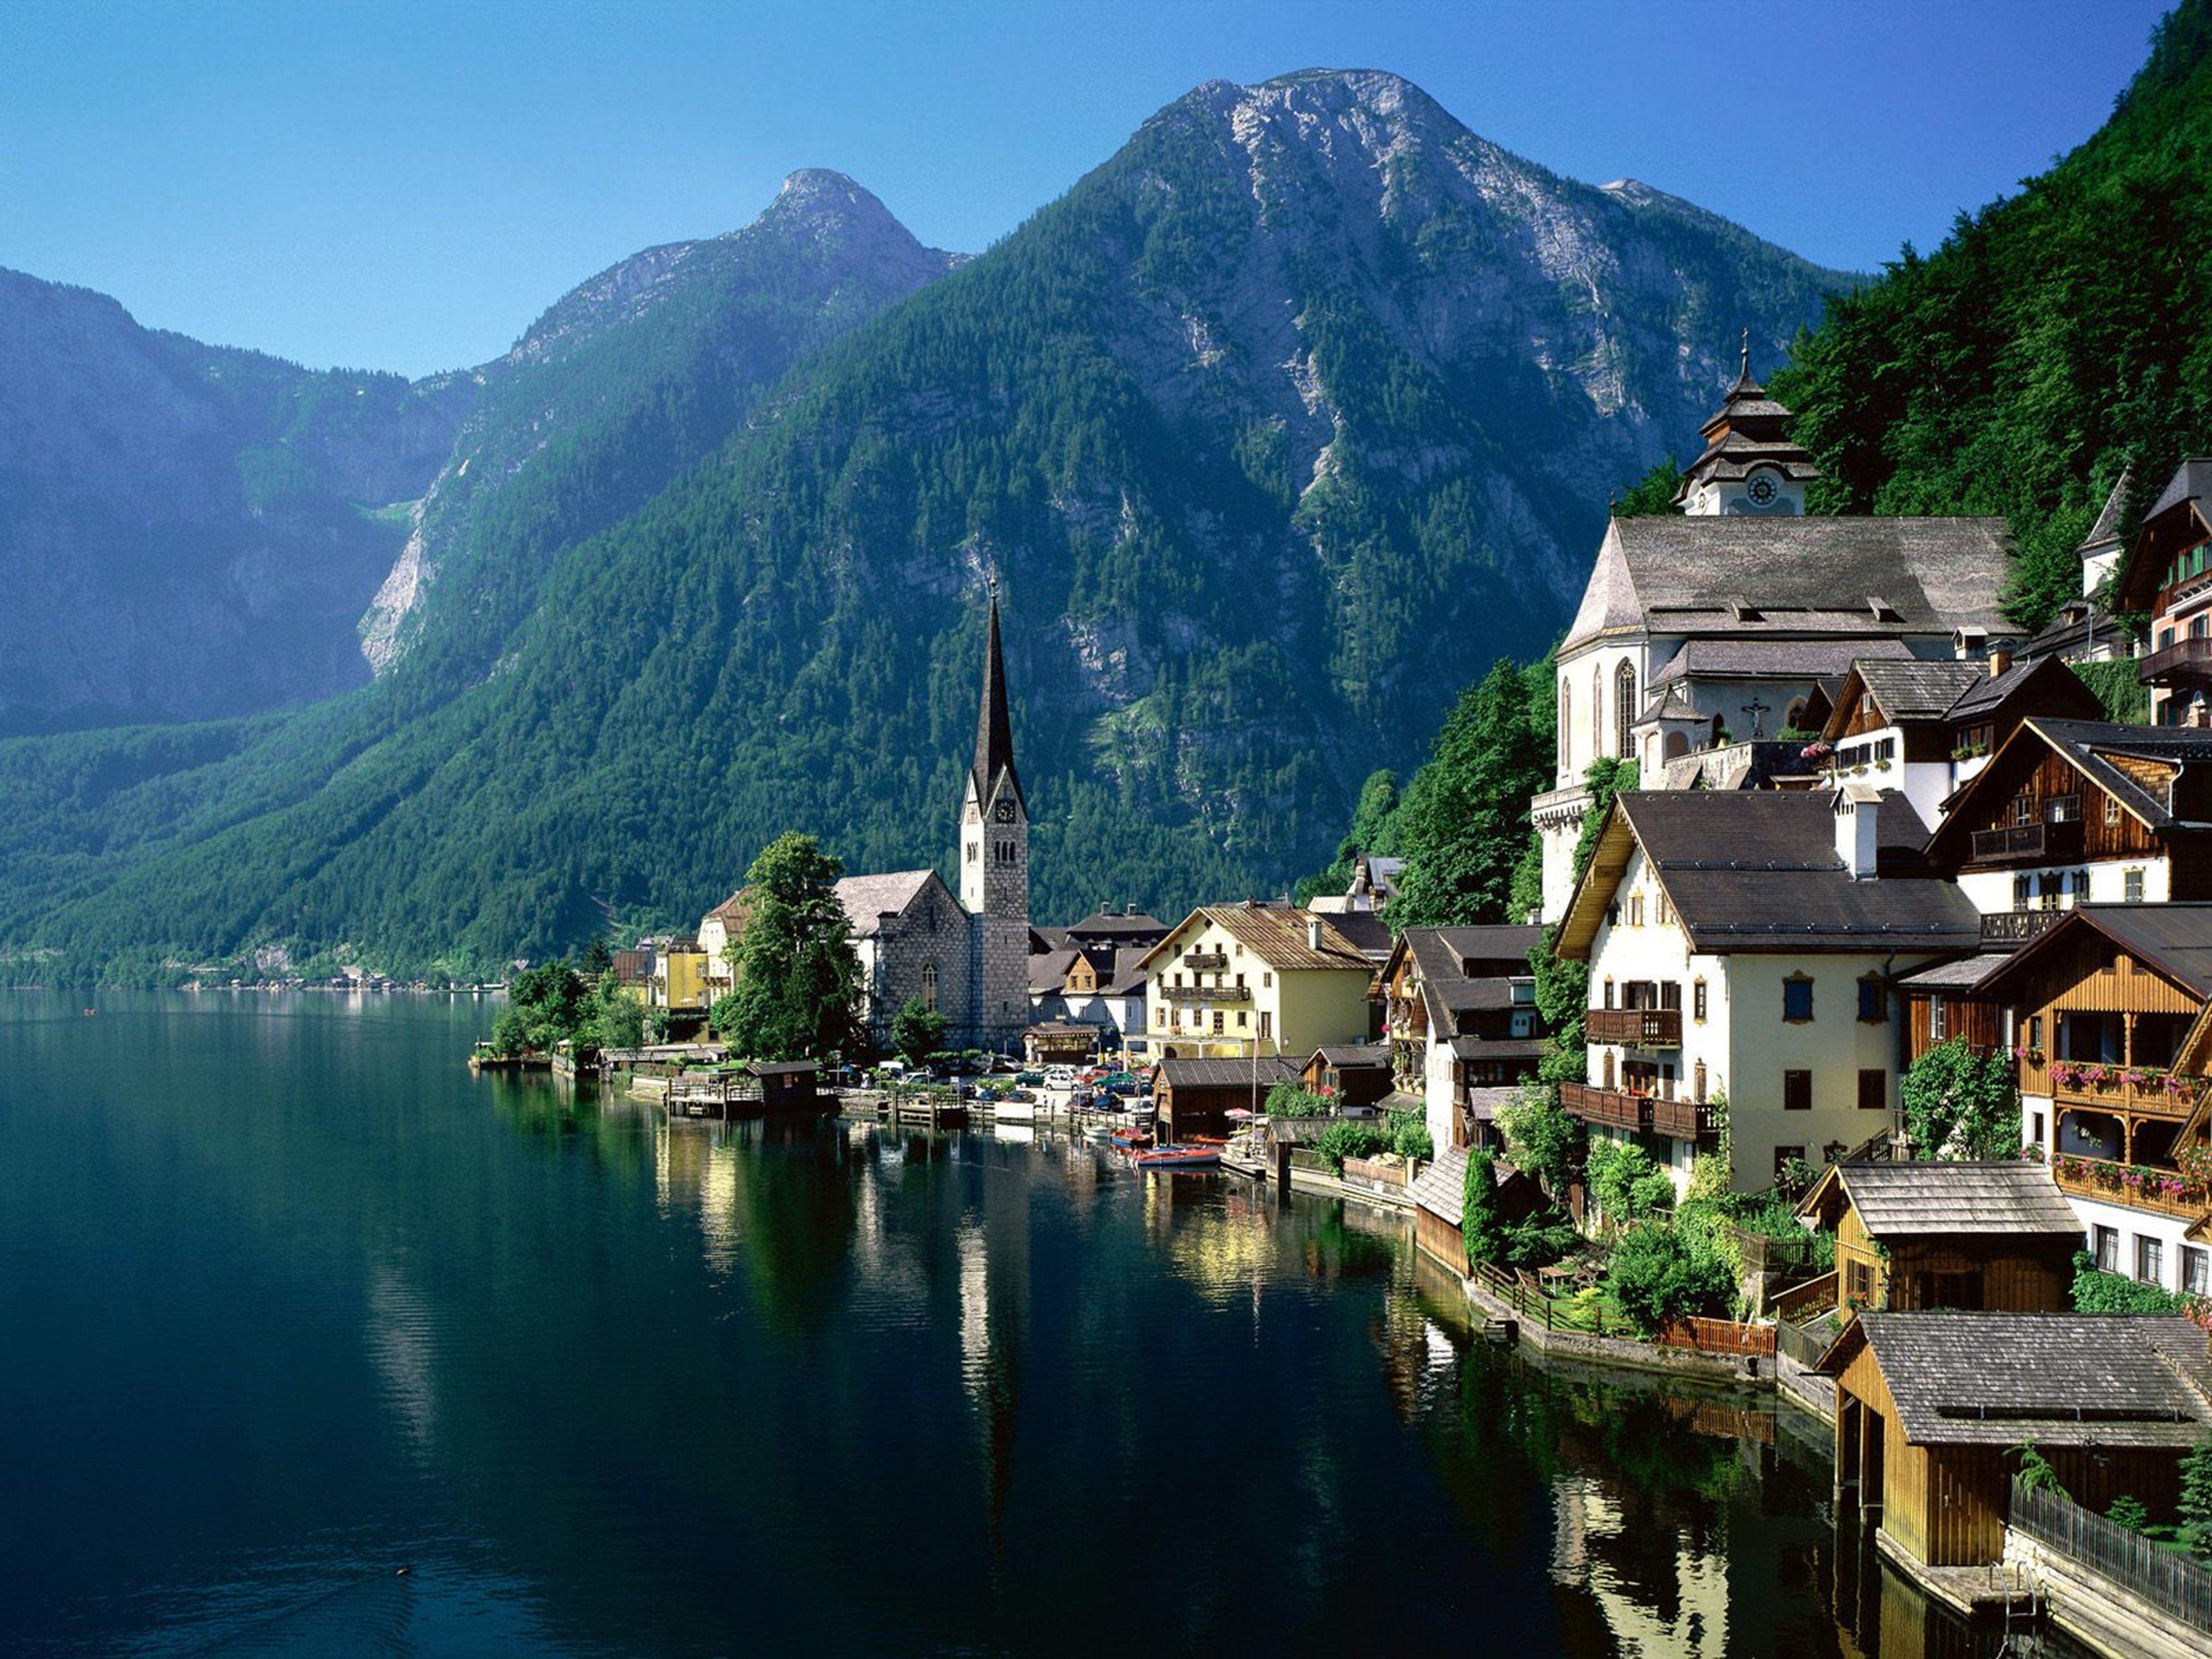 Europe Landscape Wallpapers Top Free Europe Landscape Images, Photos, Reviews